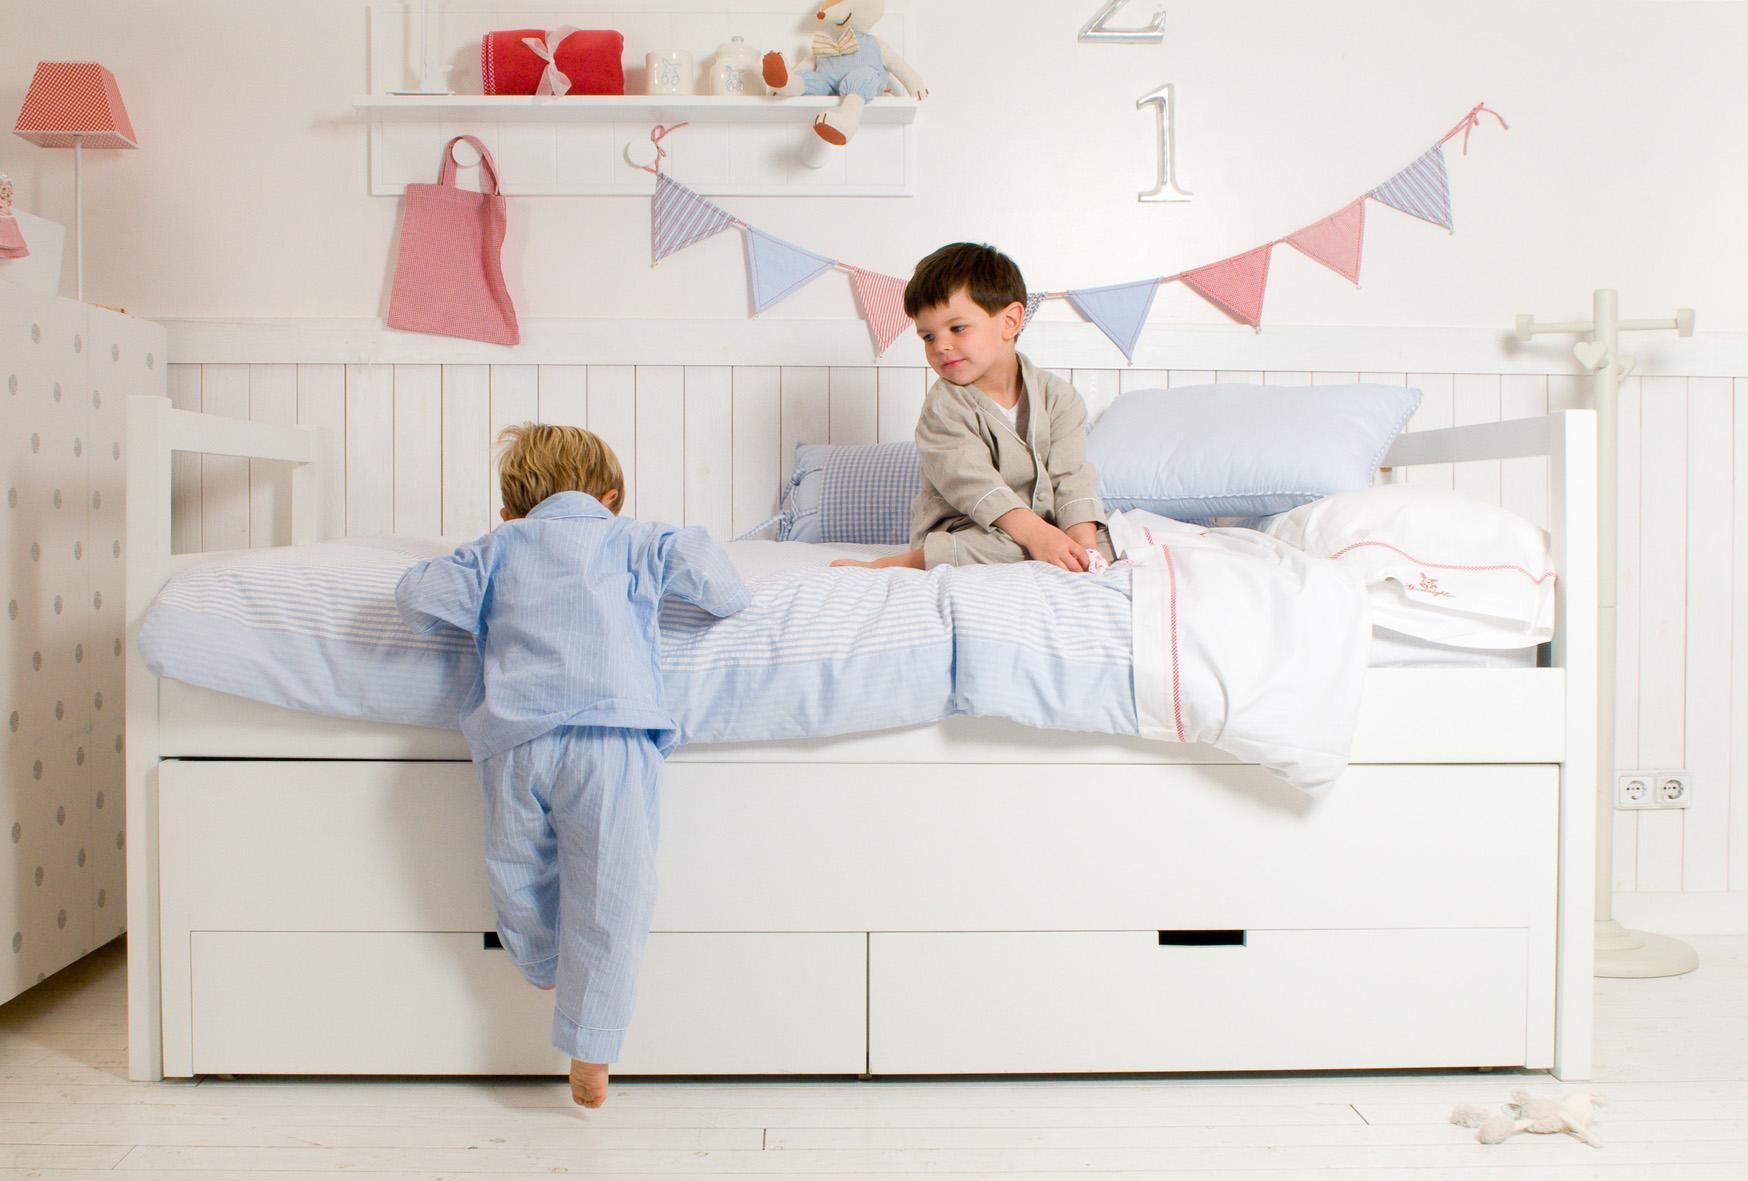 Camas nido muebles infantiles - Habitacion infantil cama nido ...